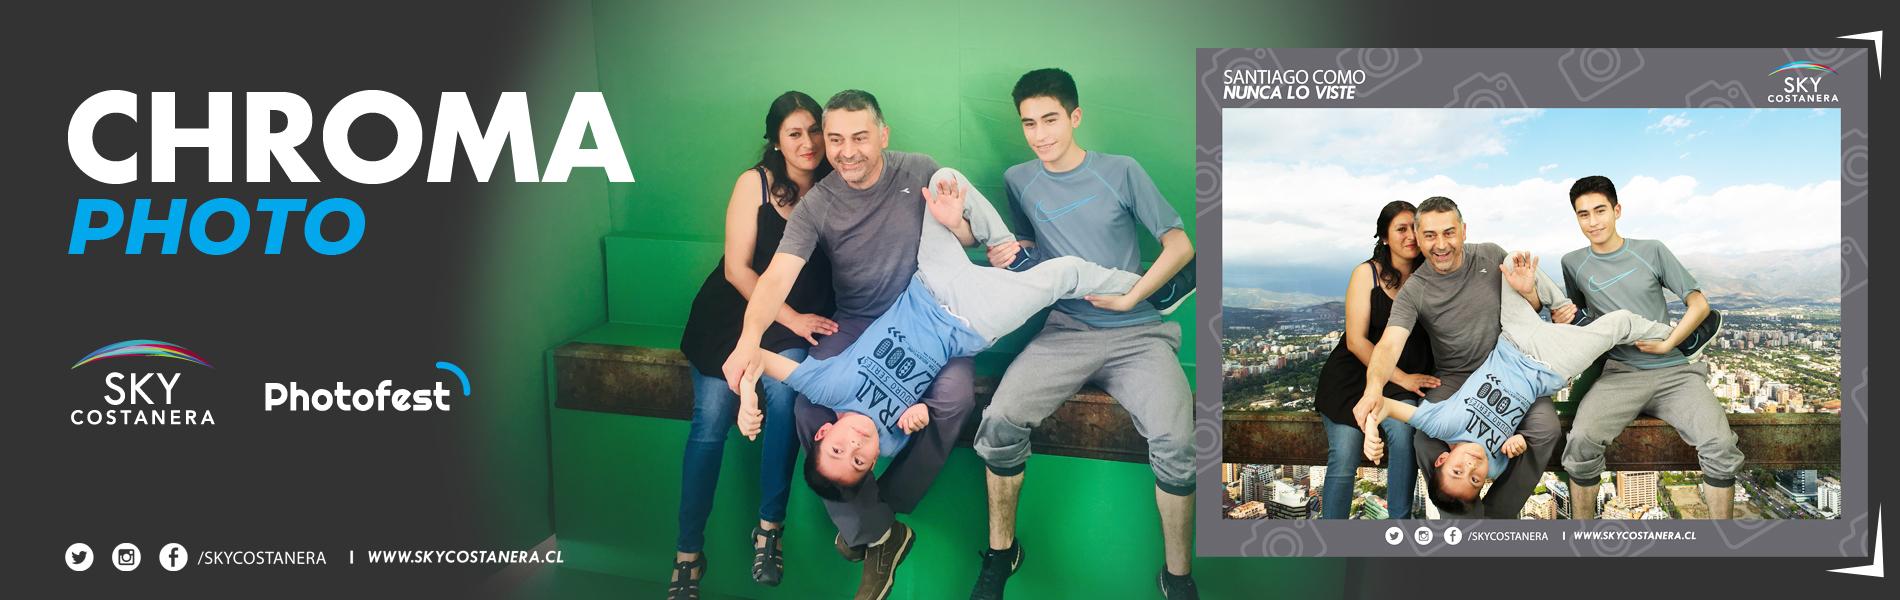 PhotoFest - cabina de fotos mensajes - photo booth - photobooth ...